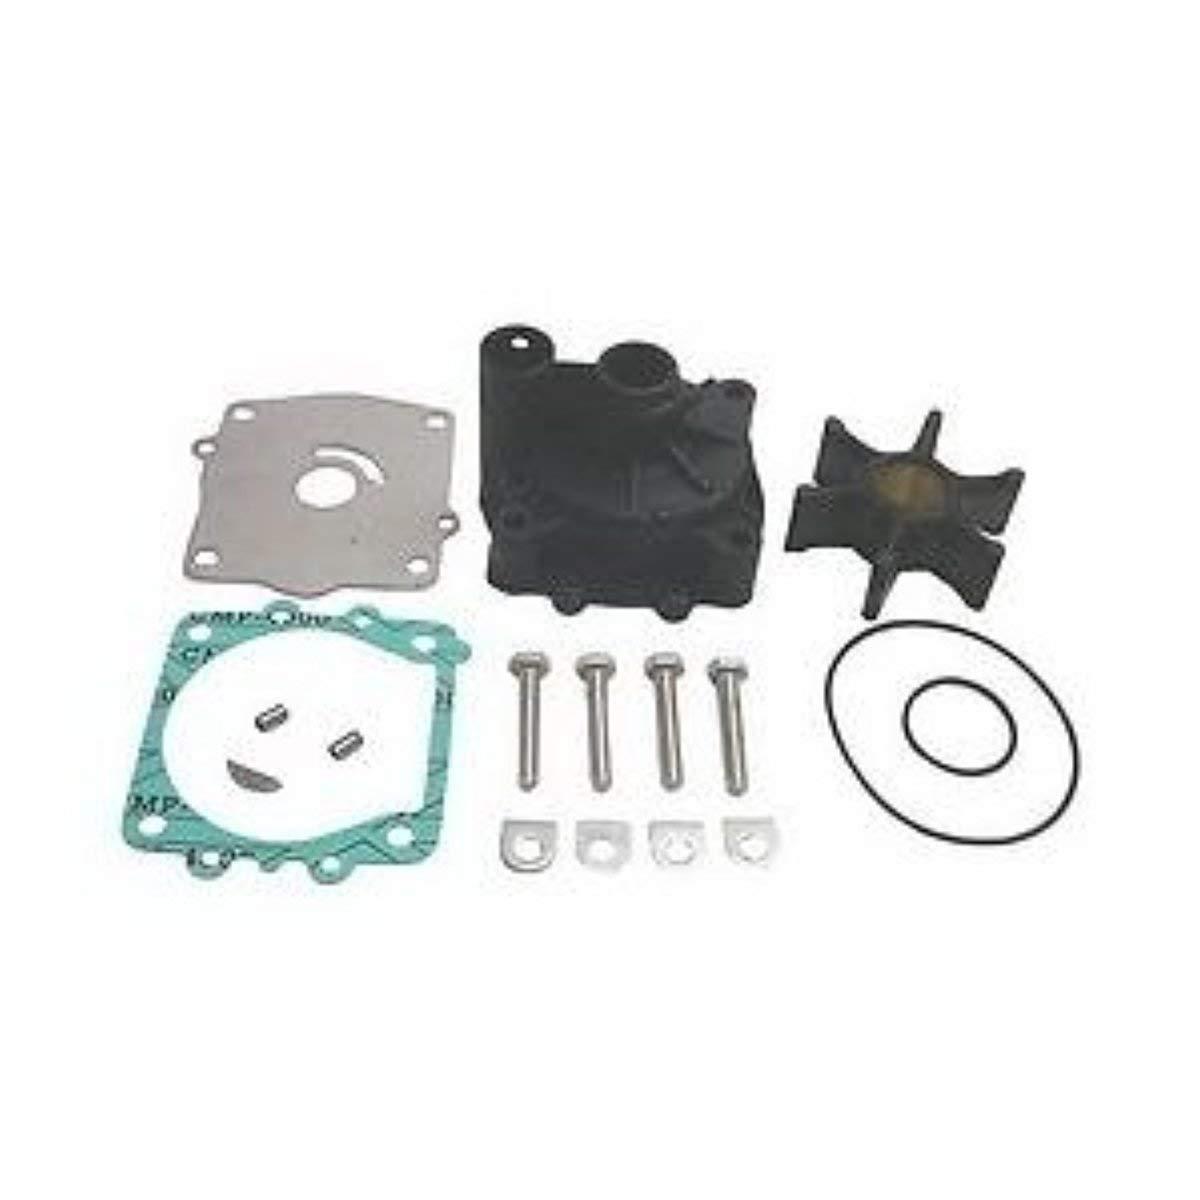 6E5-W0078-A1 6E5-W0078-01-00 Yamaha water pump repair kit replaces